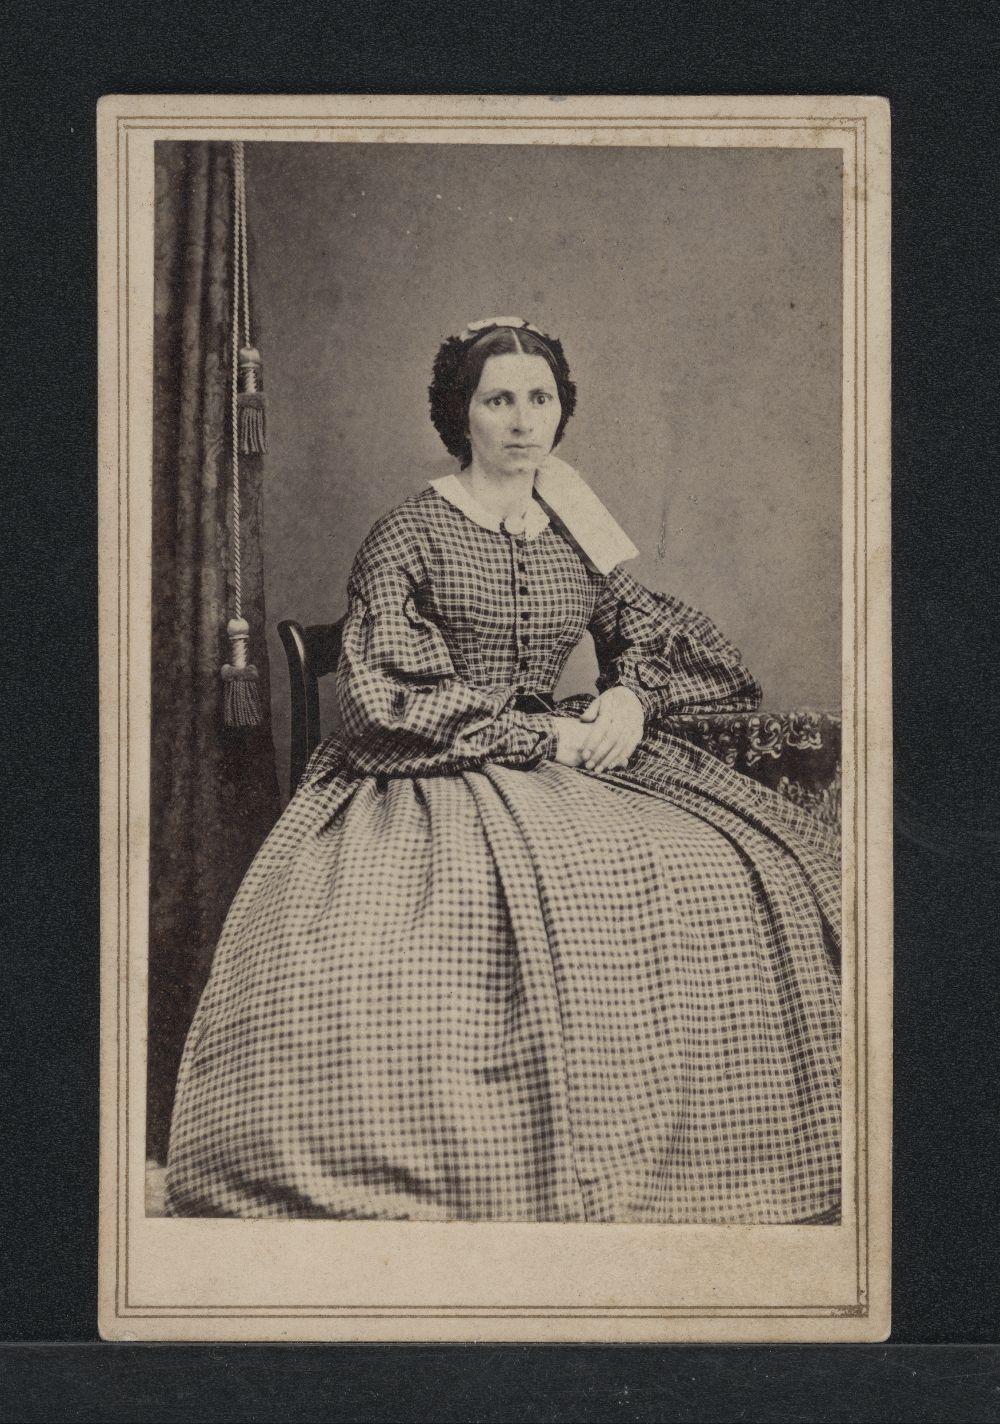 Rhoda A. (Mrs. John Henry D.) Brown